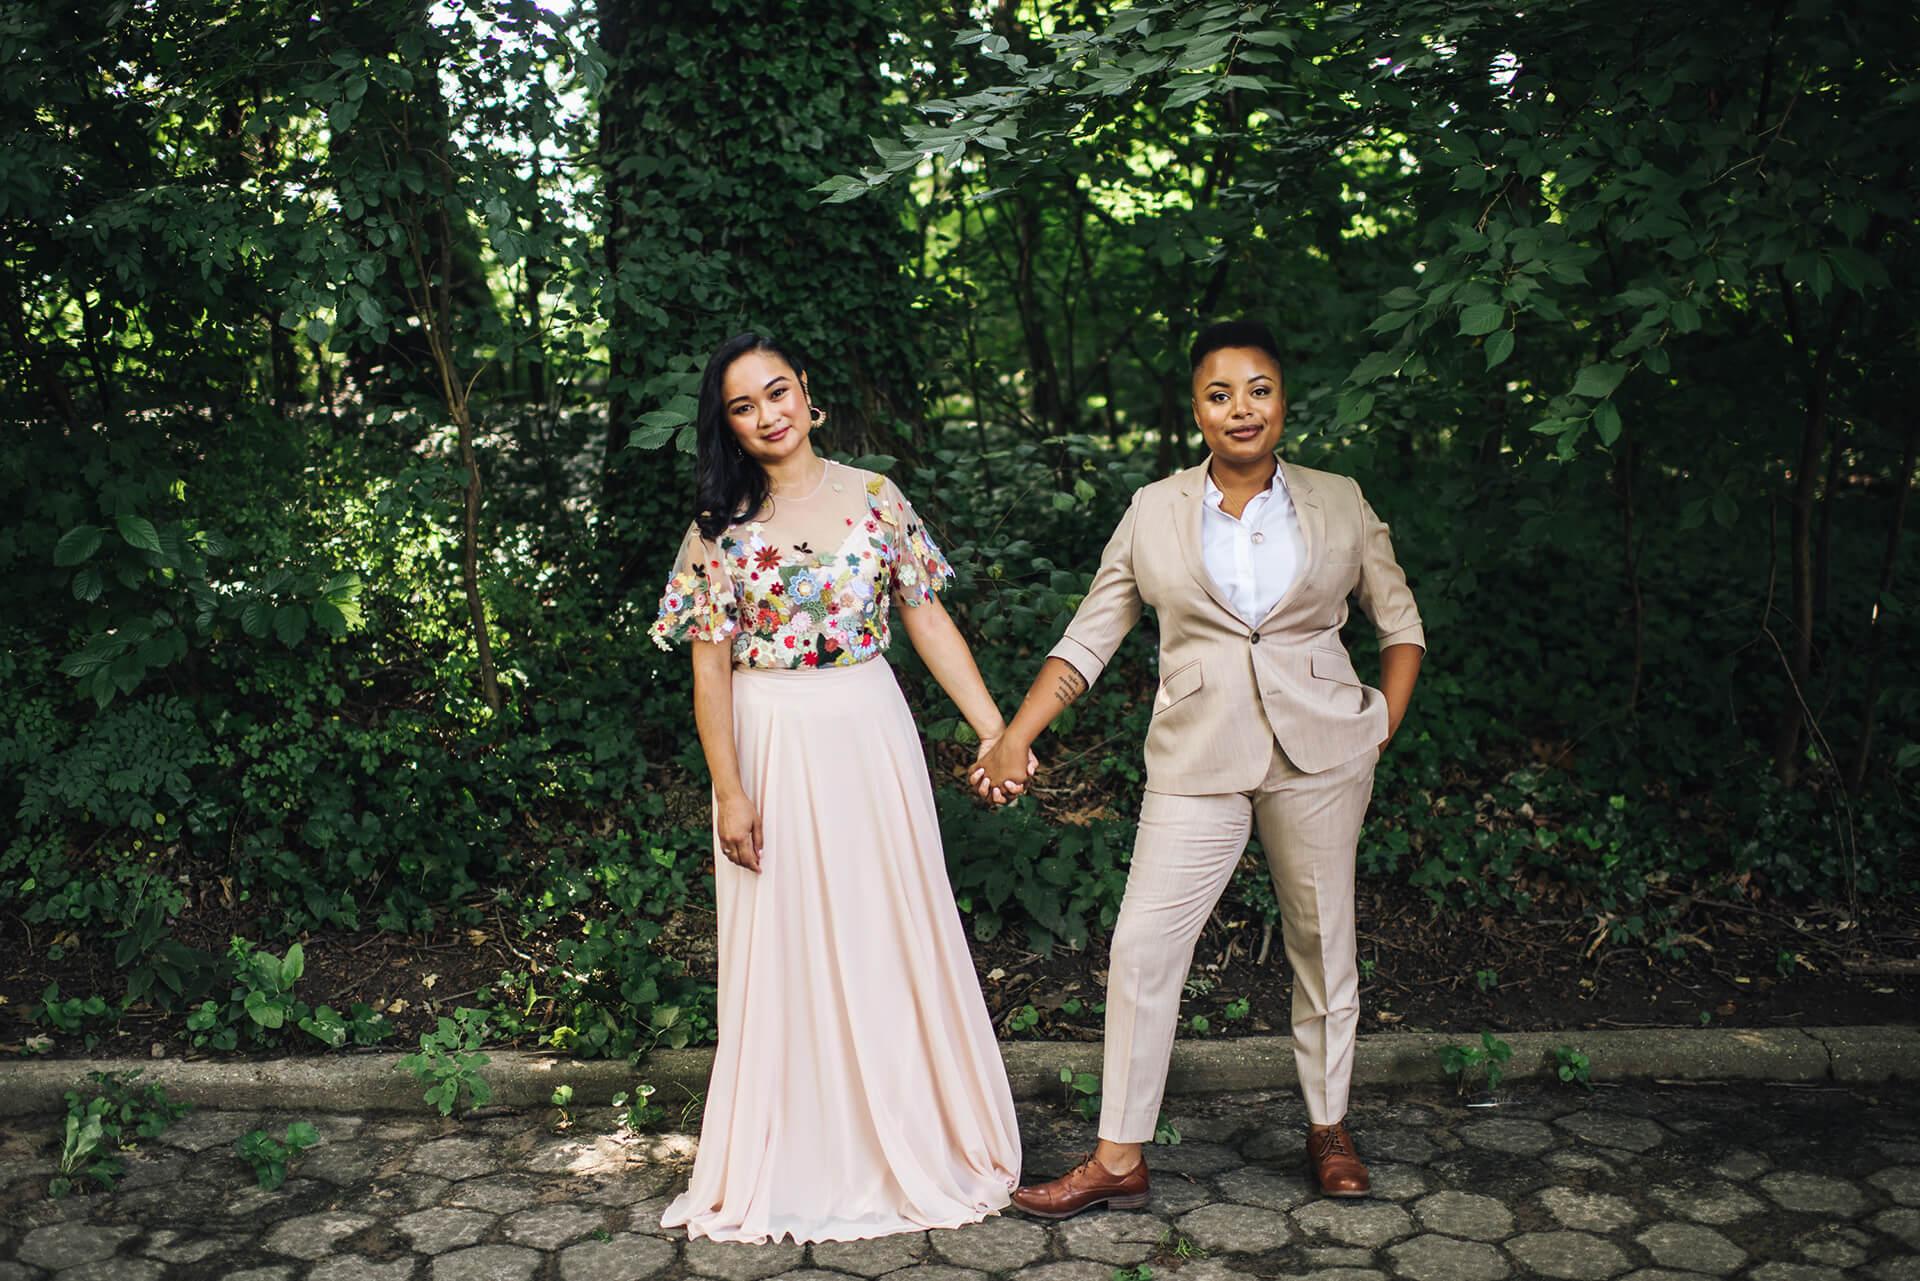 BROOKLYN SOCIETY FOR ETHICAL CULTURE - INTIMATE WEDDING - CHI-CHI ARI-88 (1).jpg